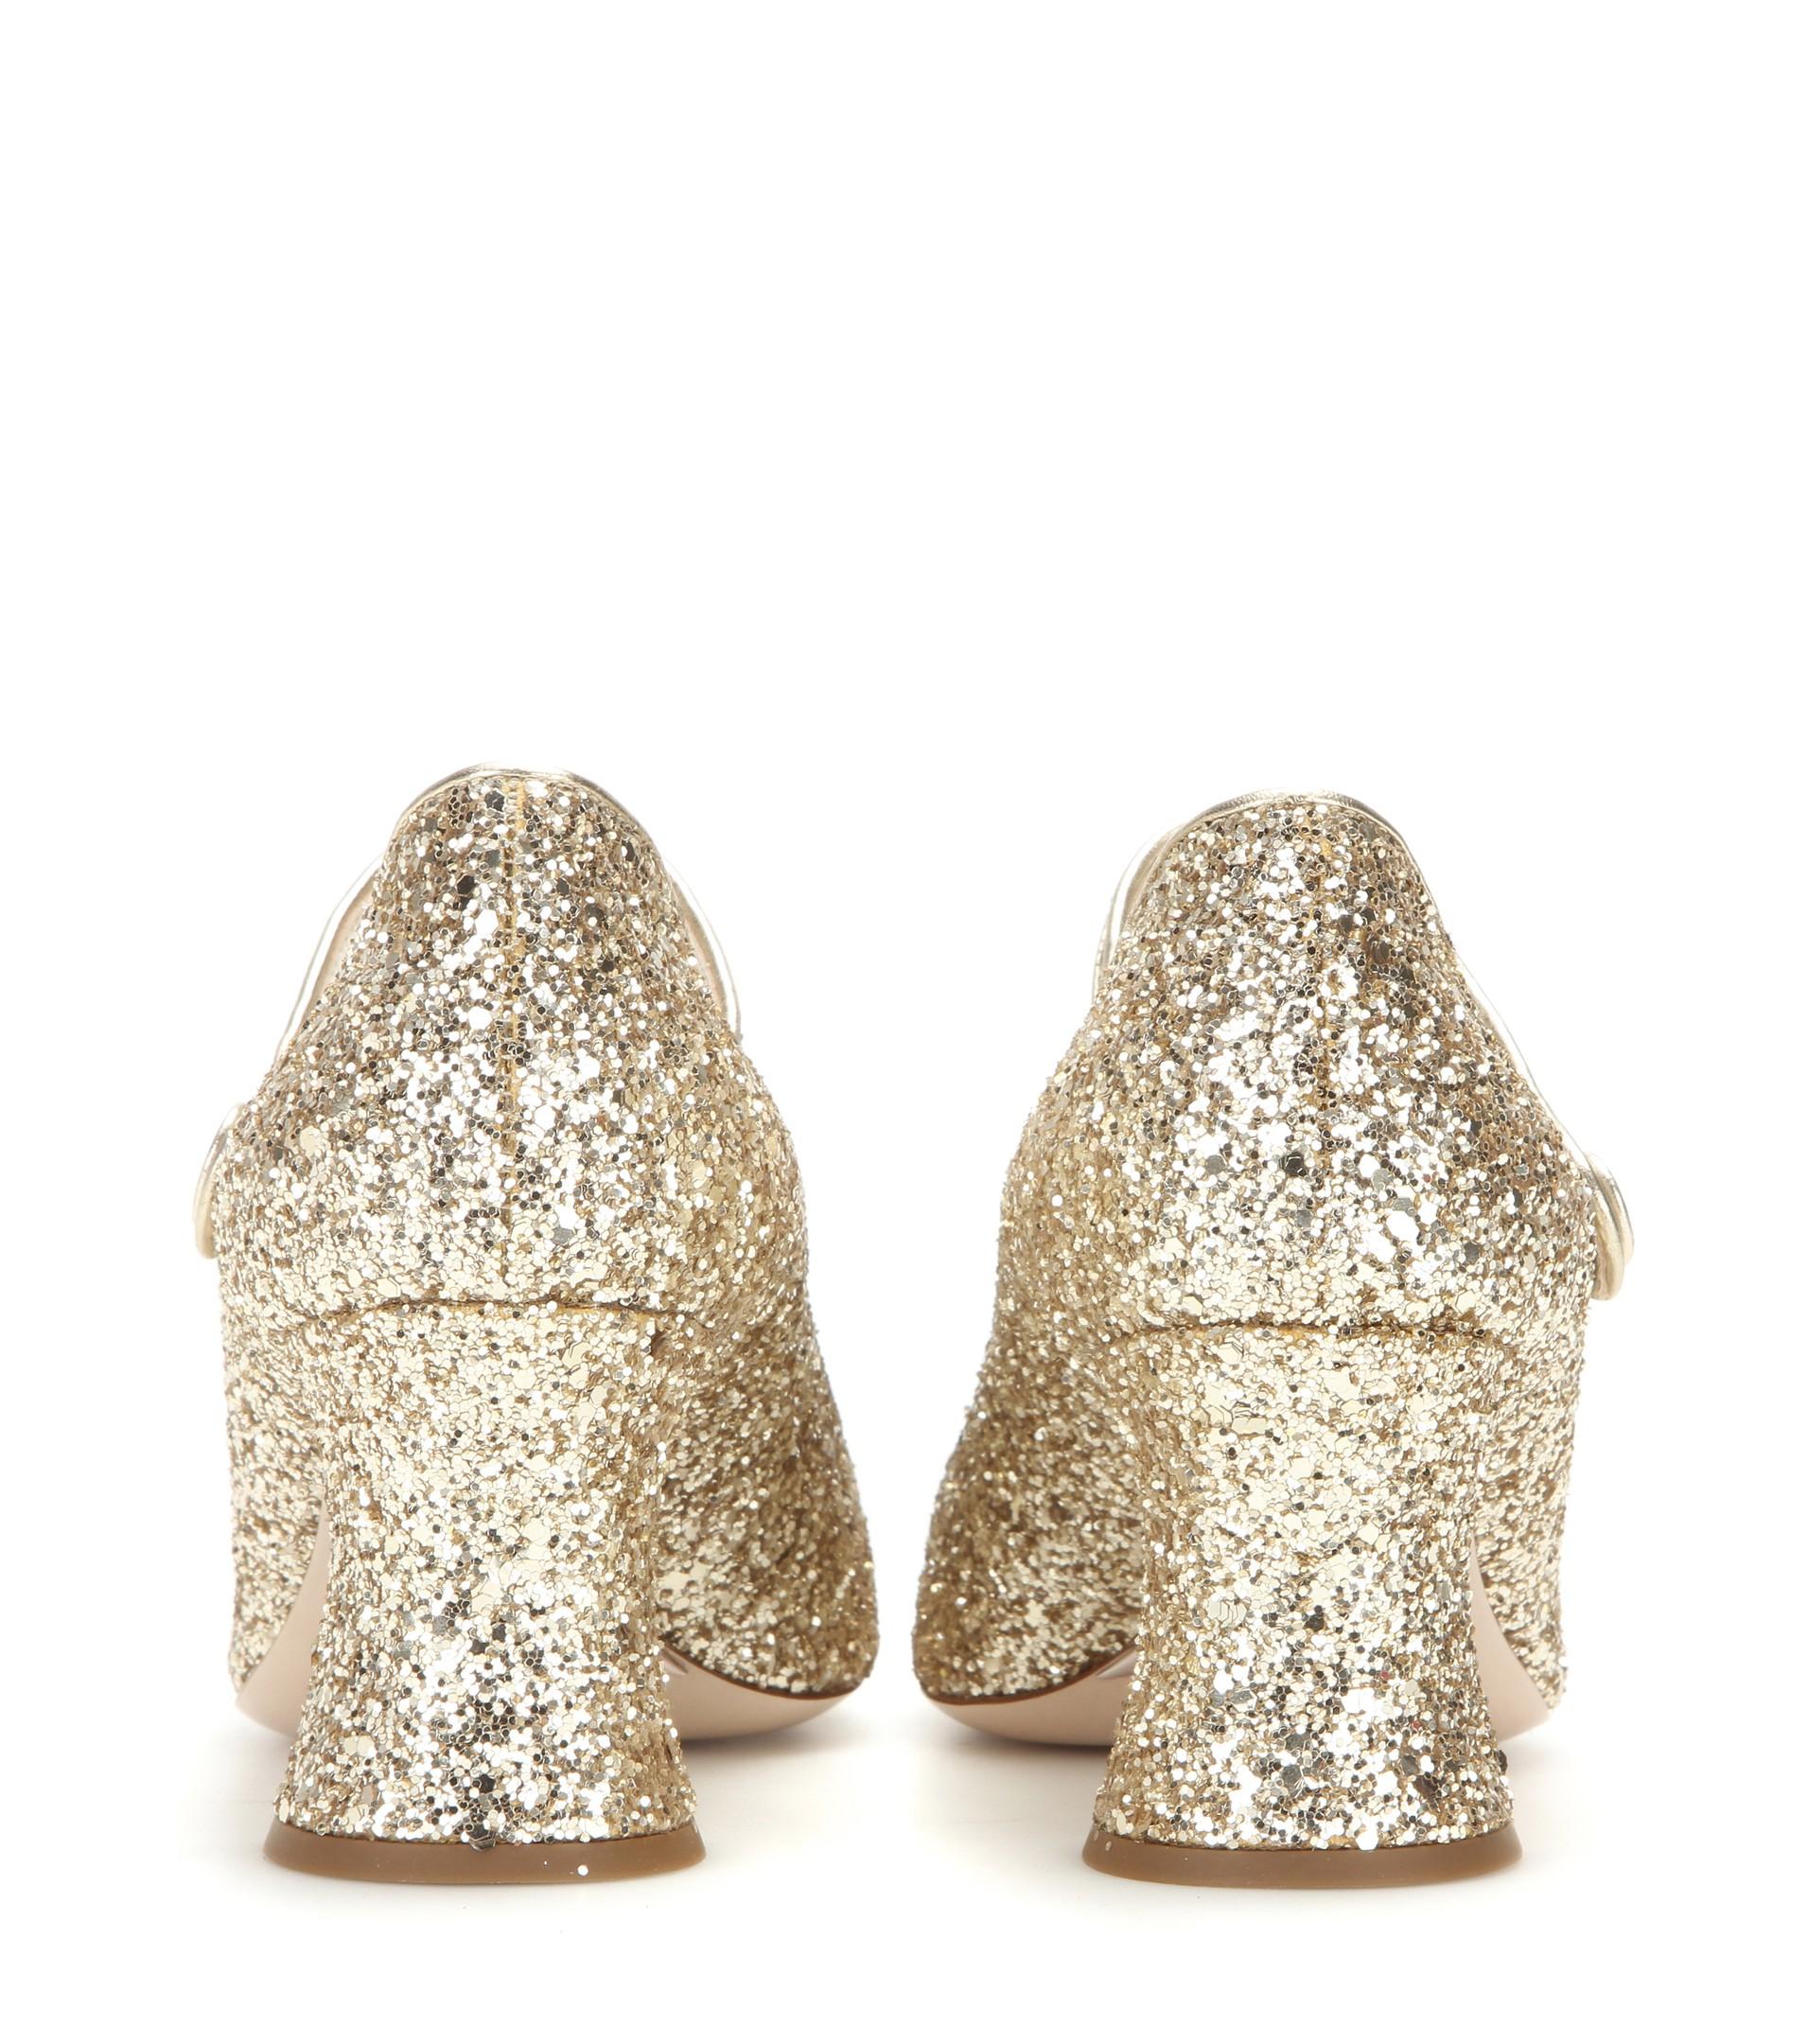 d62be0d31cb Miu Miu Gold Kitten Heels | CINEMAS 93